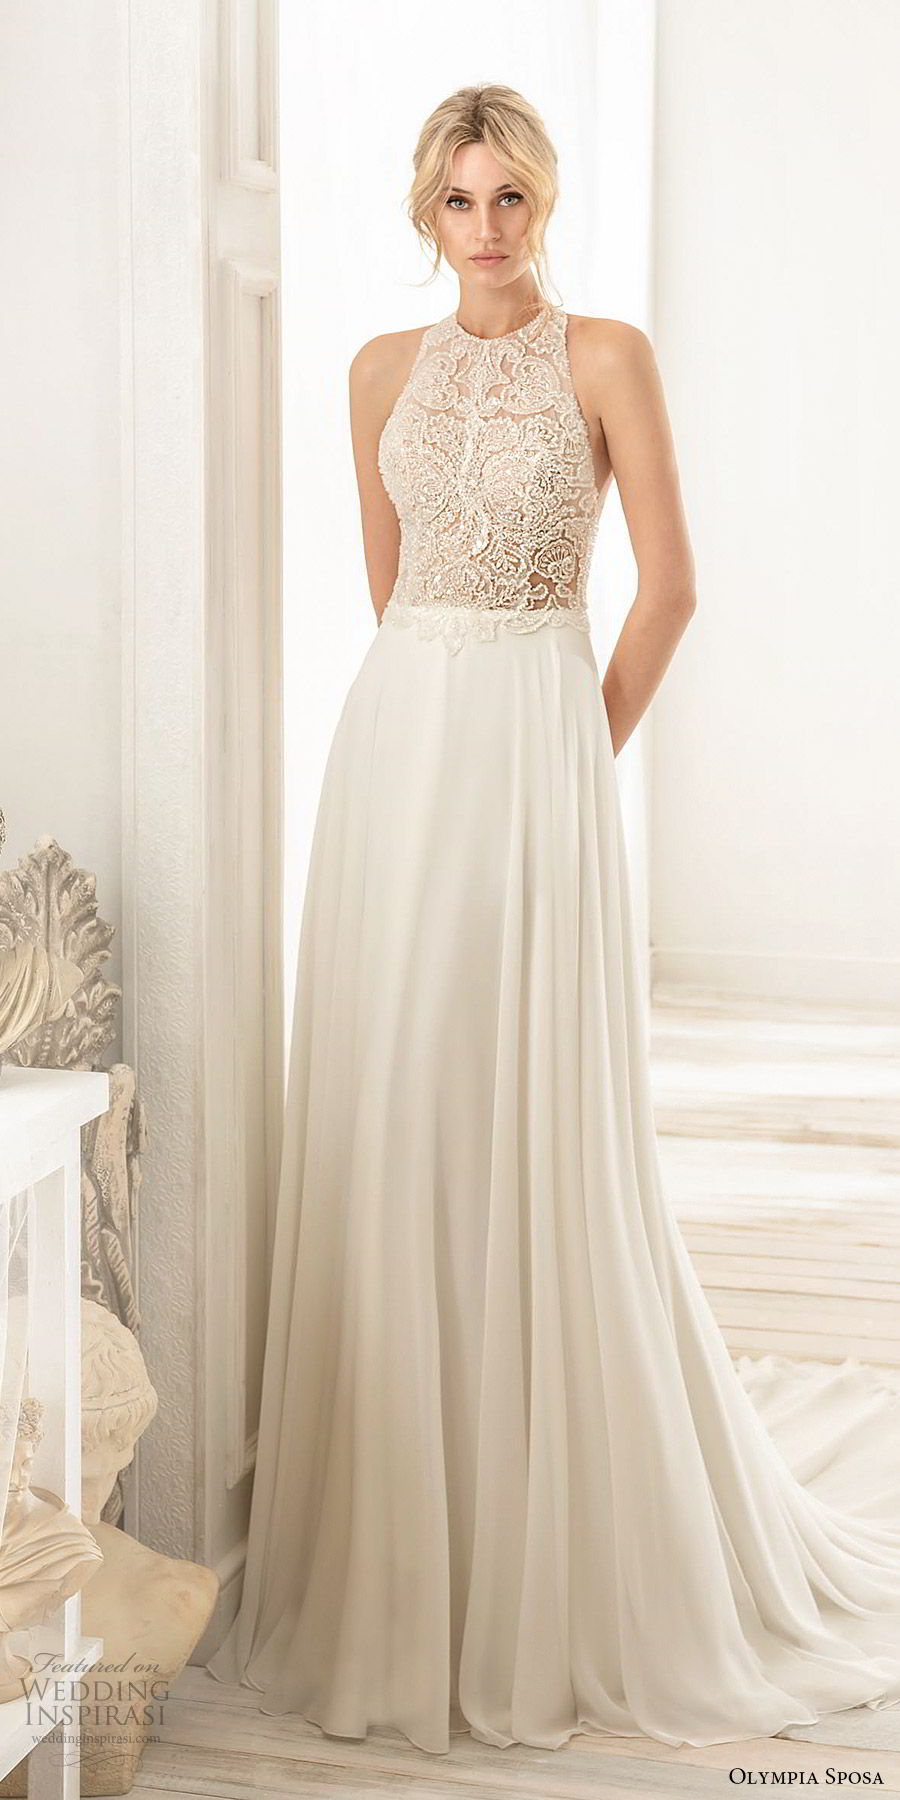 olympia sposa 2020 bridal sleeveless halter neck embellished beaded bodice a line wedding dress (5) romantic elegant racer back chapel train  mv